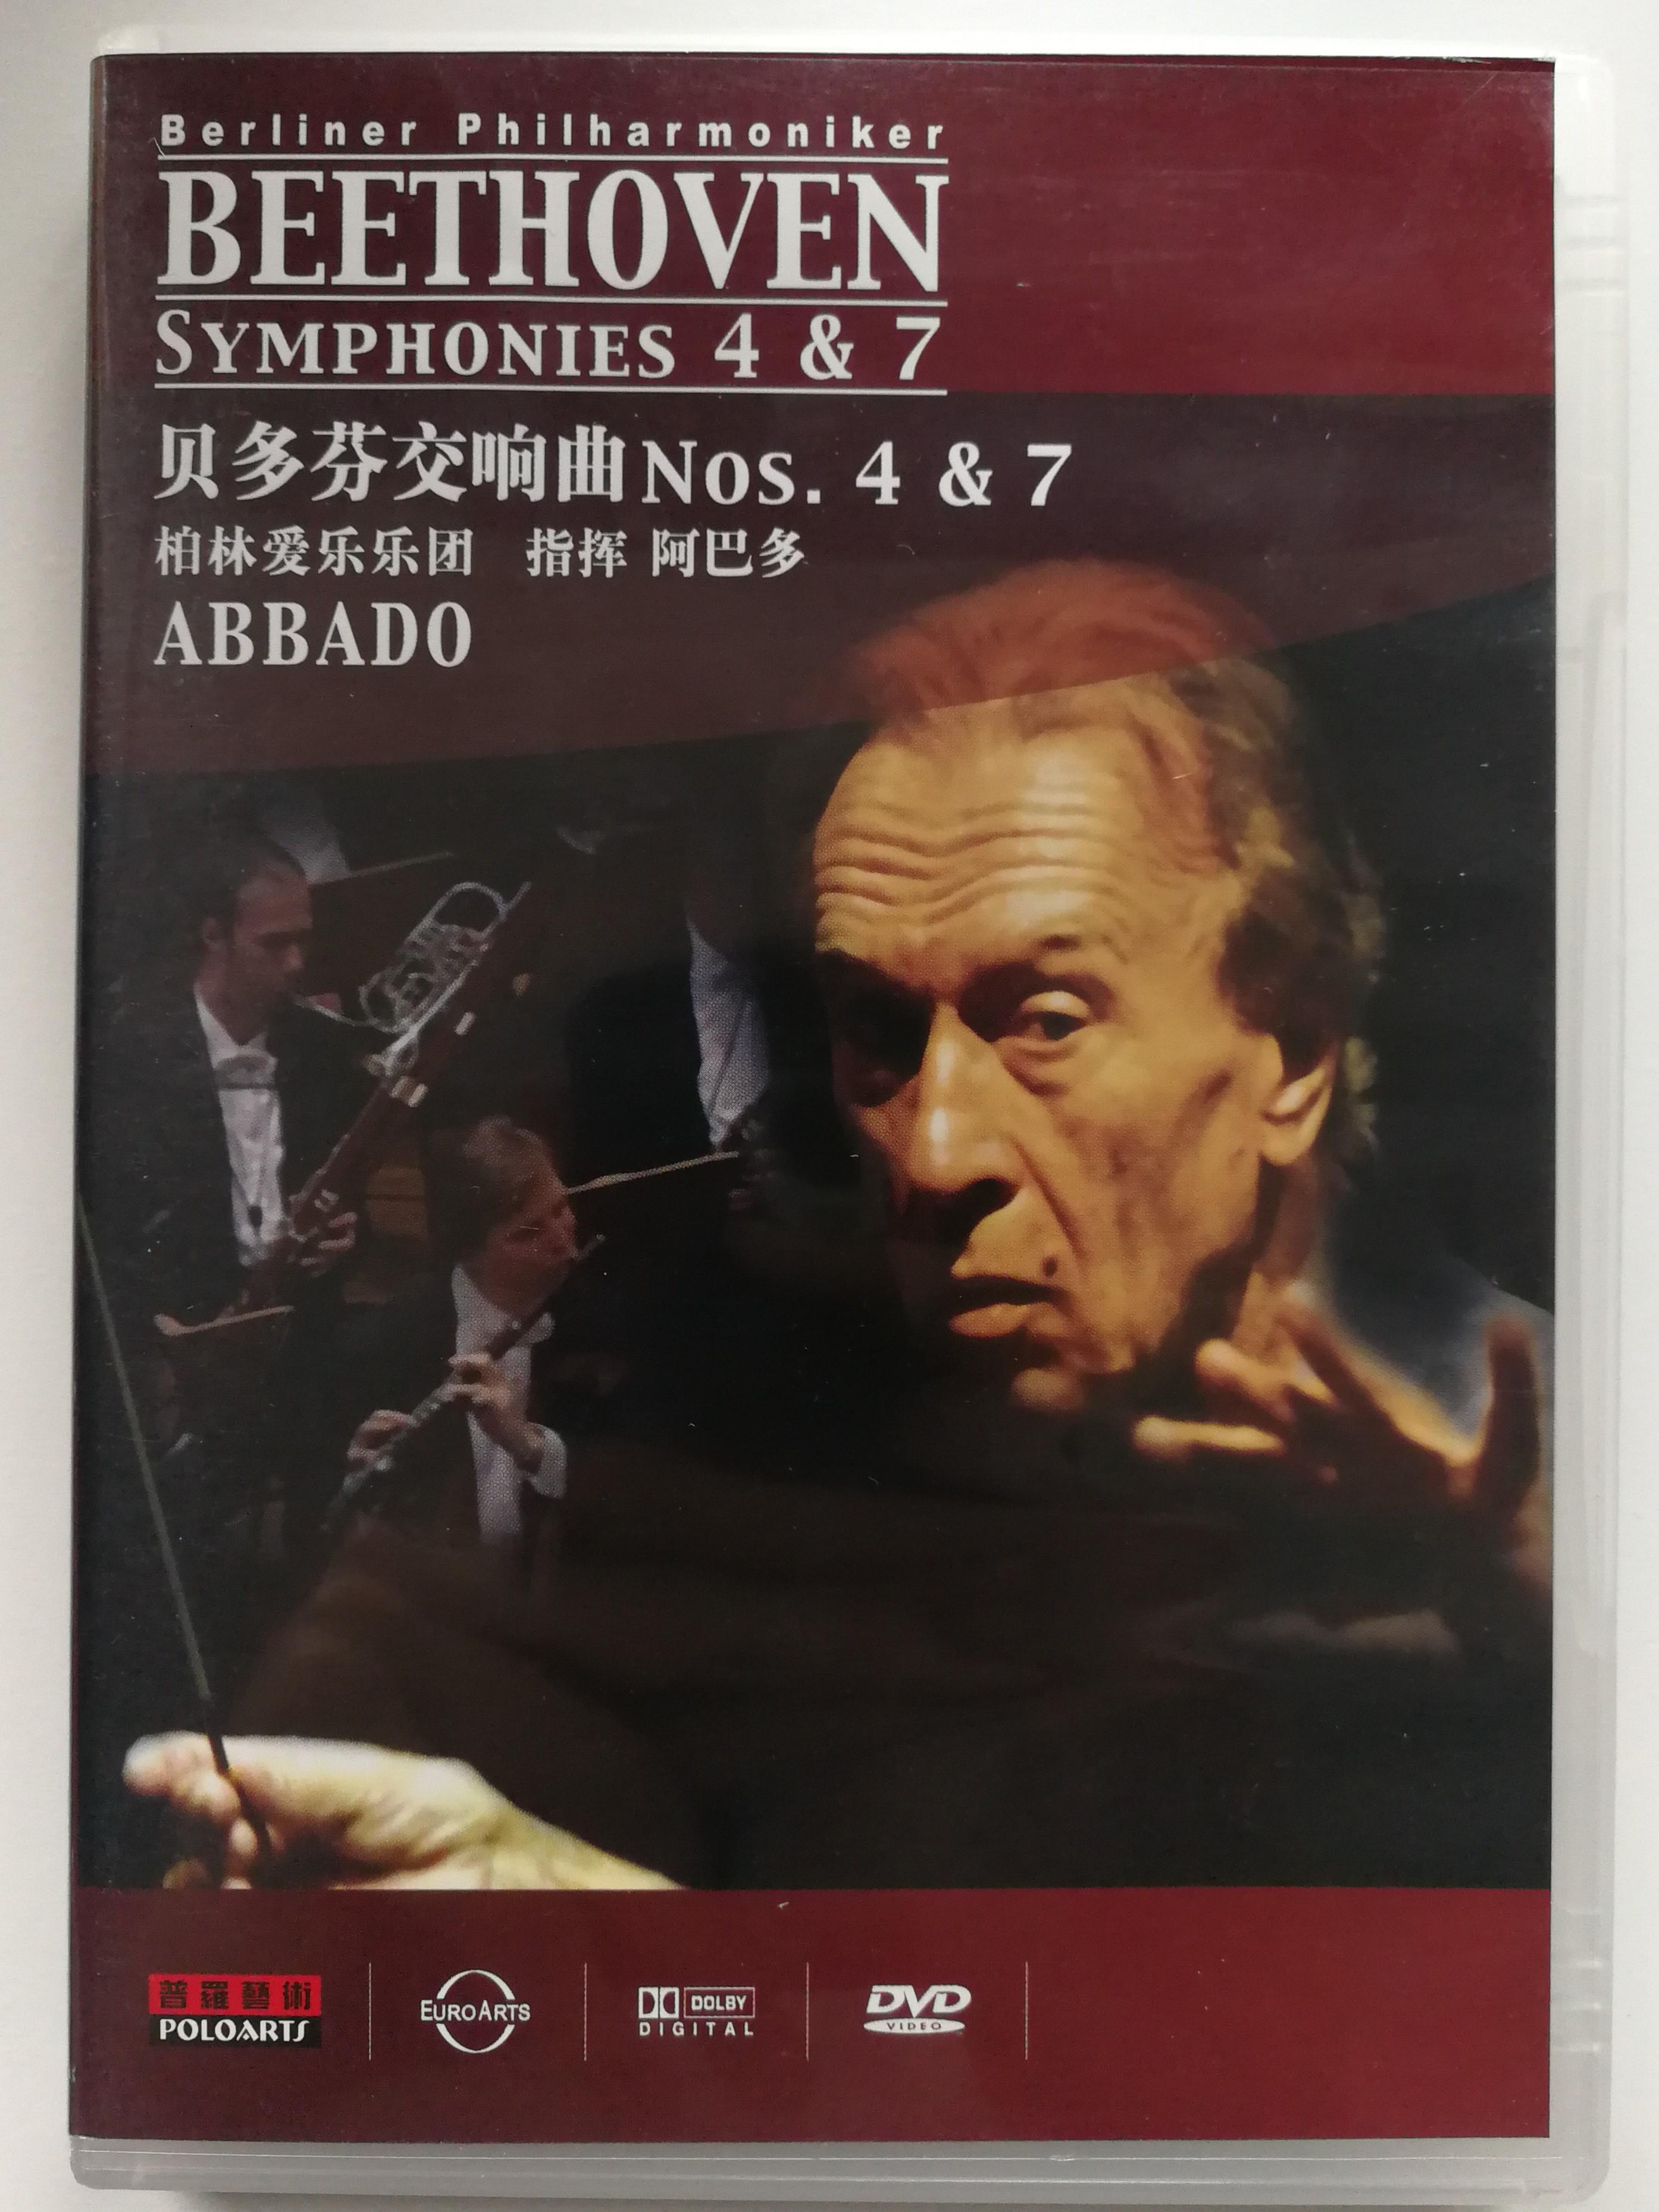 beethoven-symphonies-4-7-abbadon-dvd-2001-1.jpg